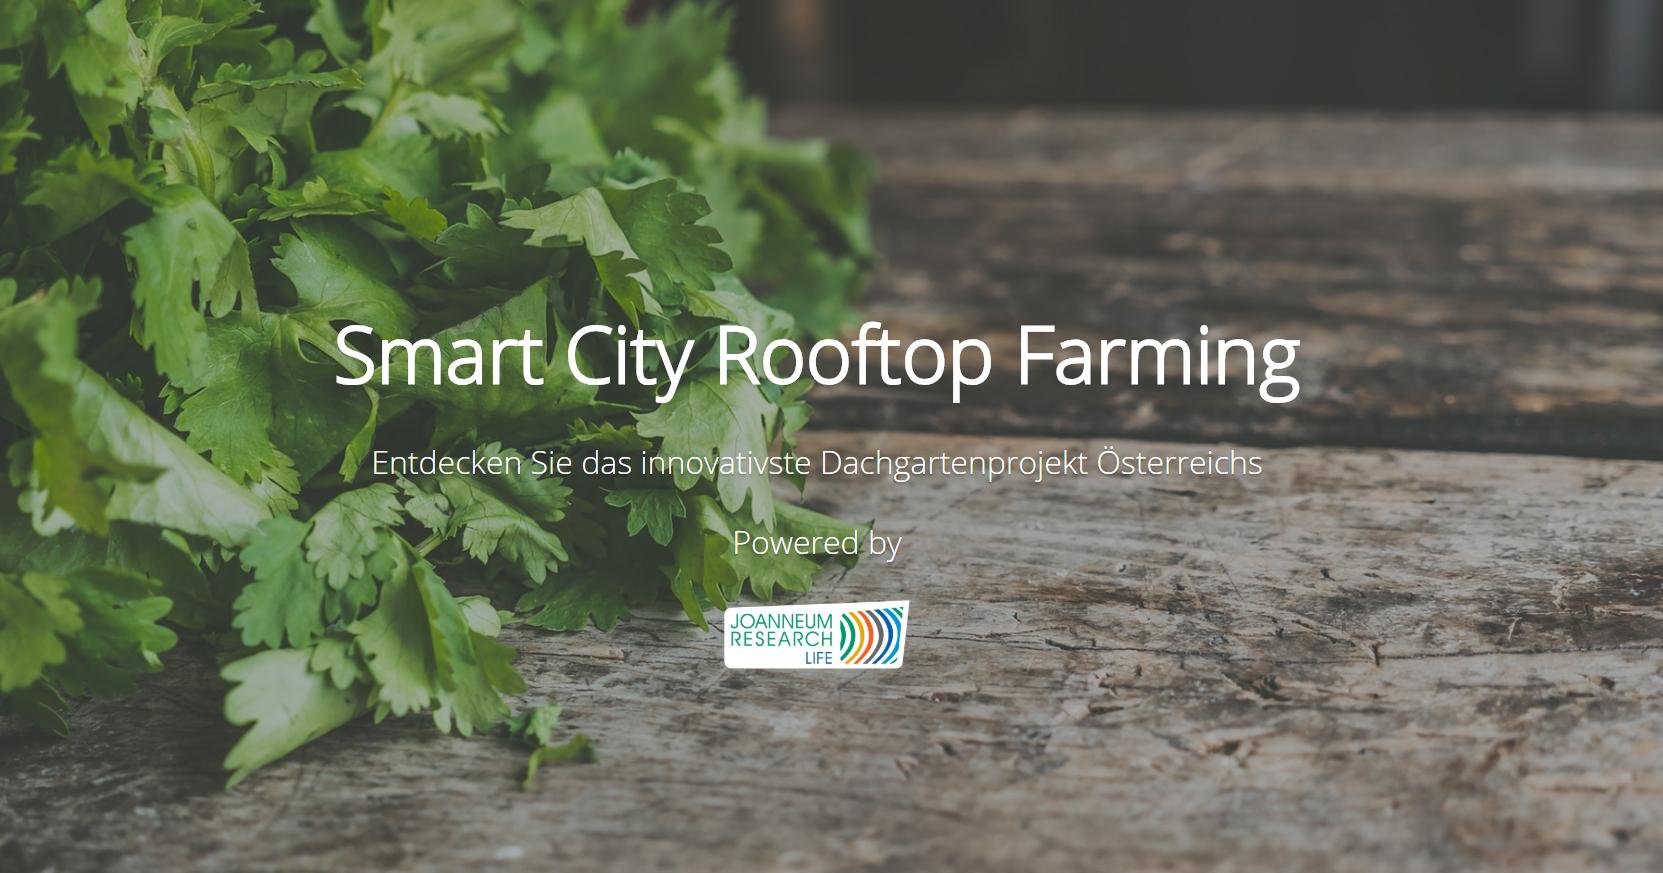 Smart City Rooftop Farming Smart City Rooftop Farming